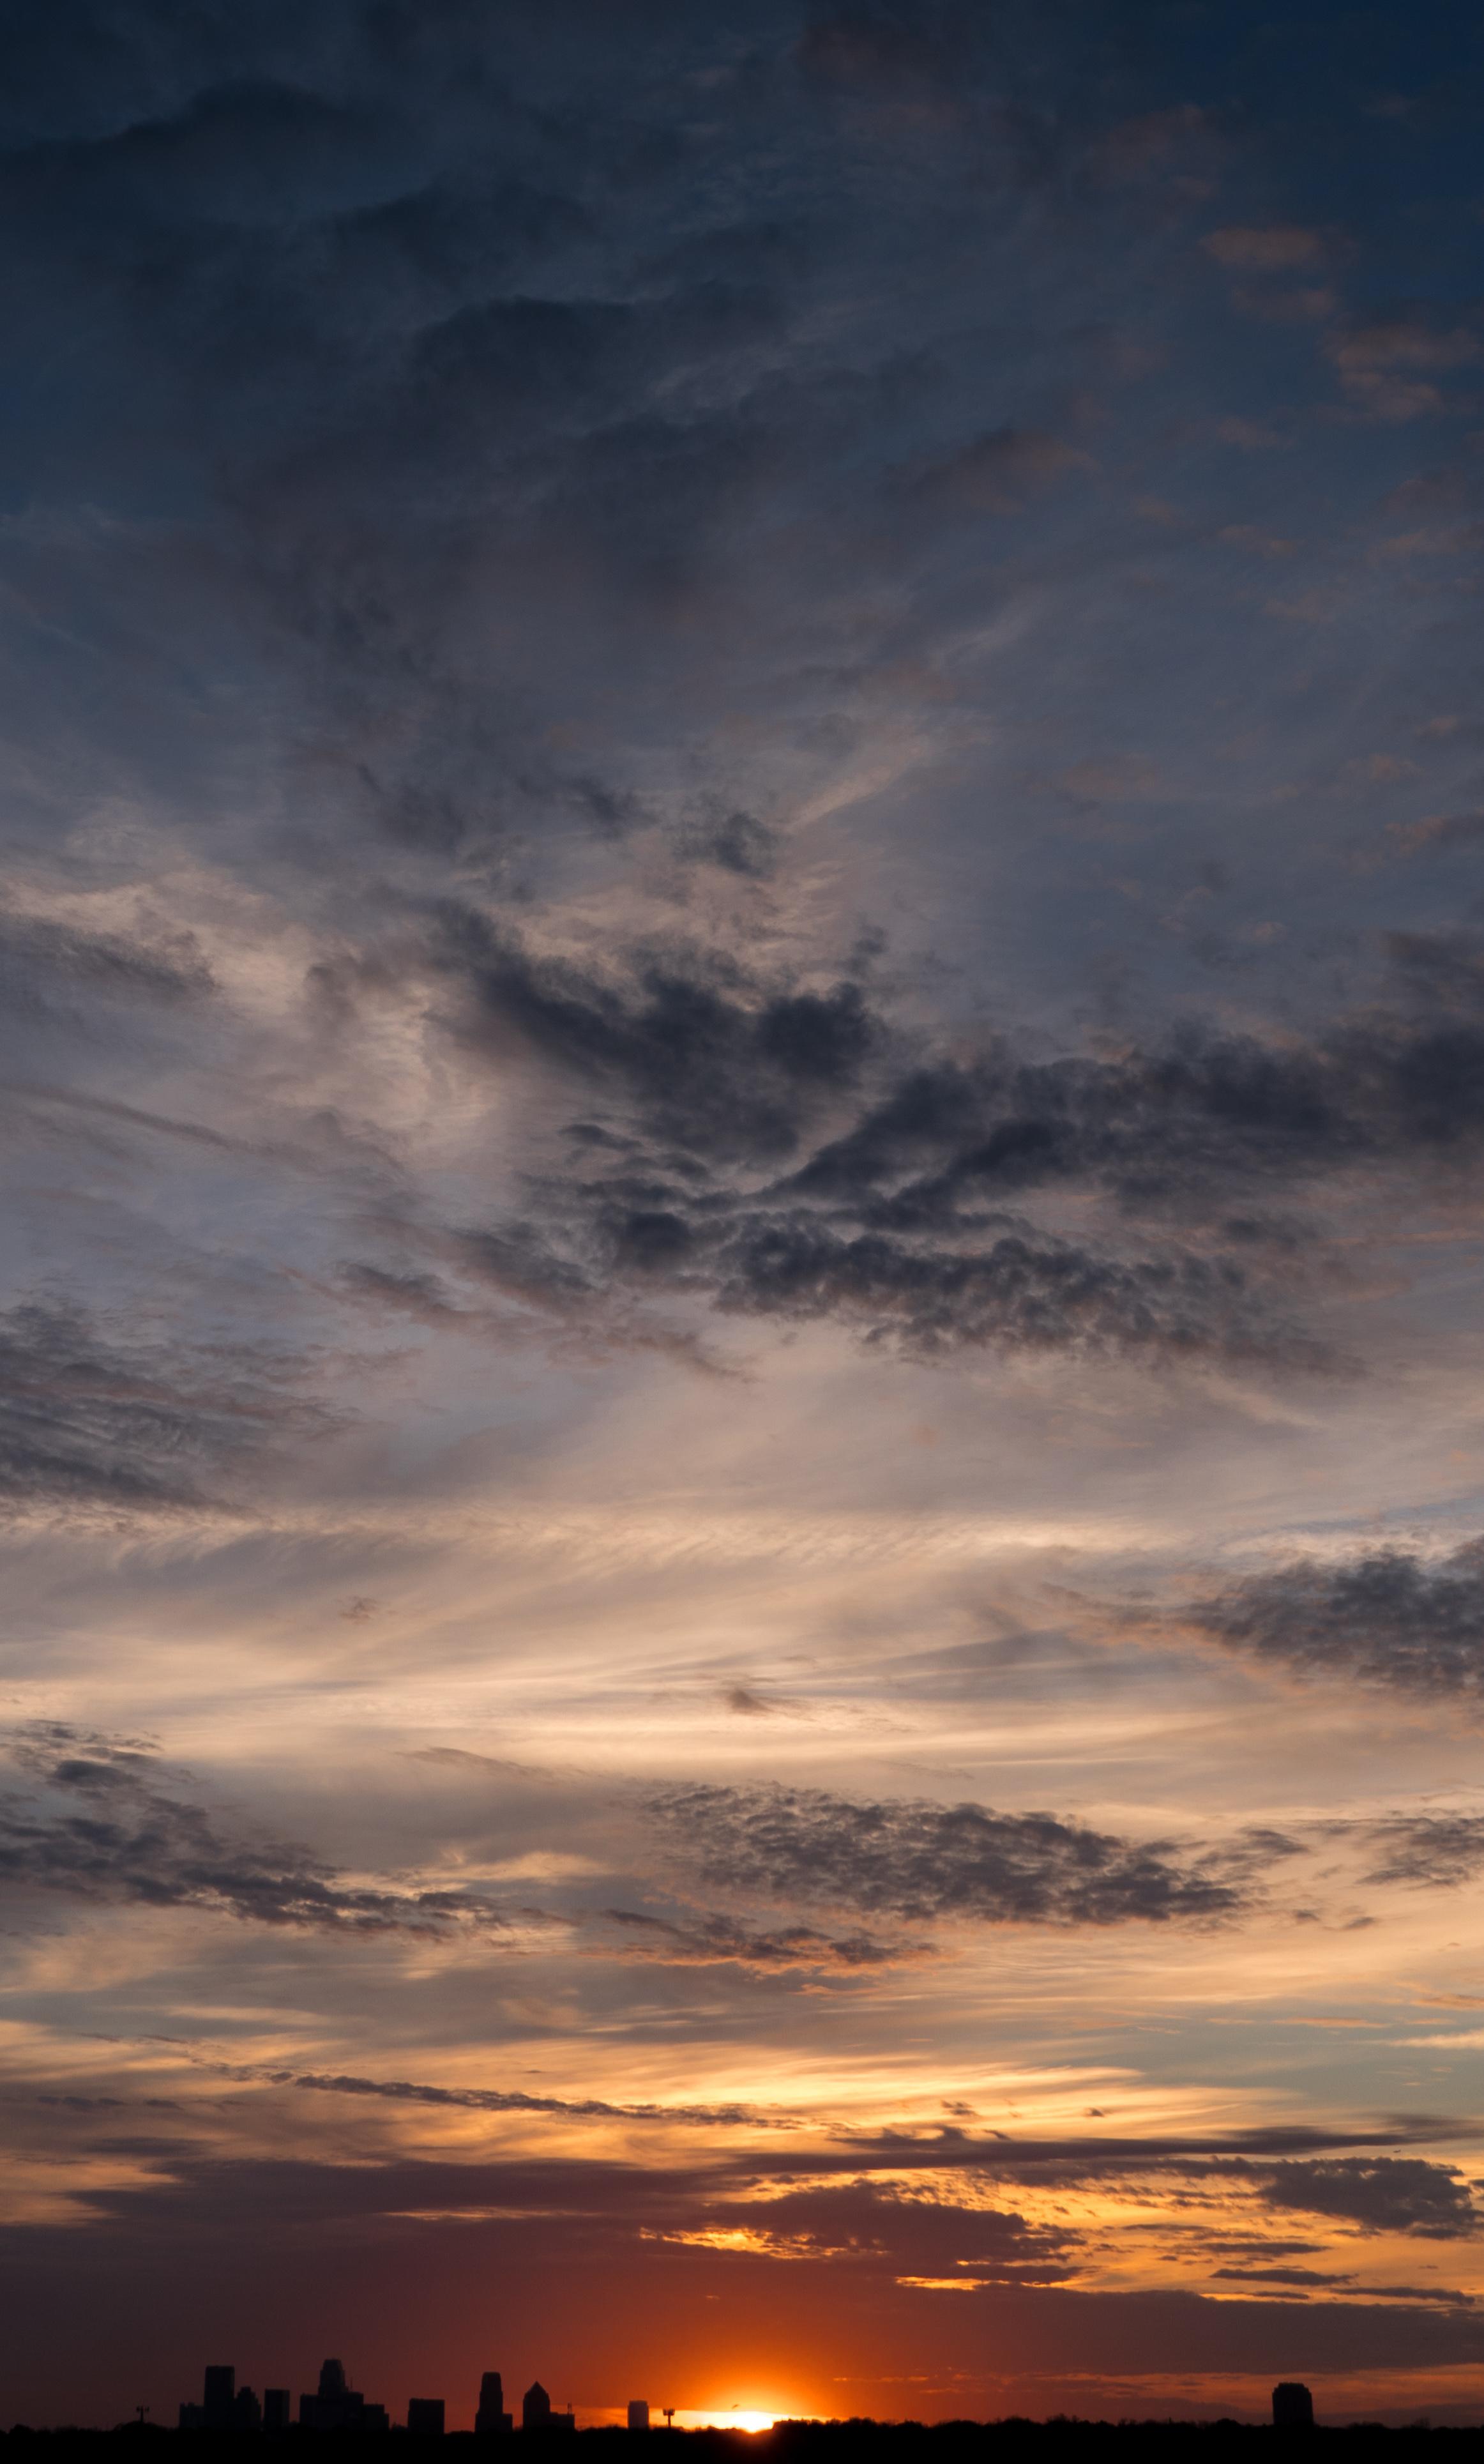 sunset2-1.jpg